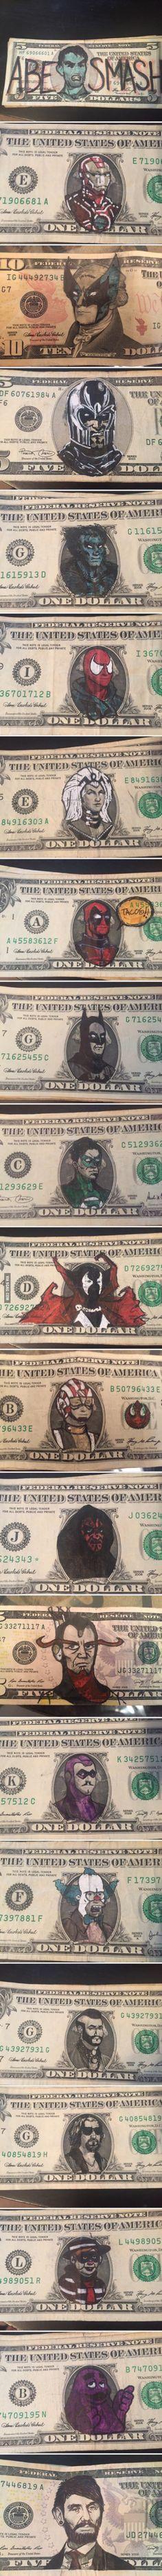 I'd buy that dollar for 5 dollars!